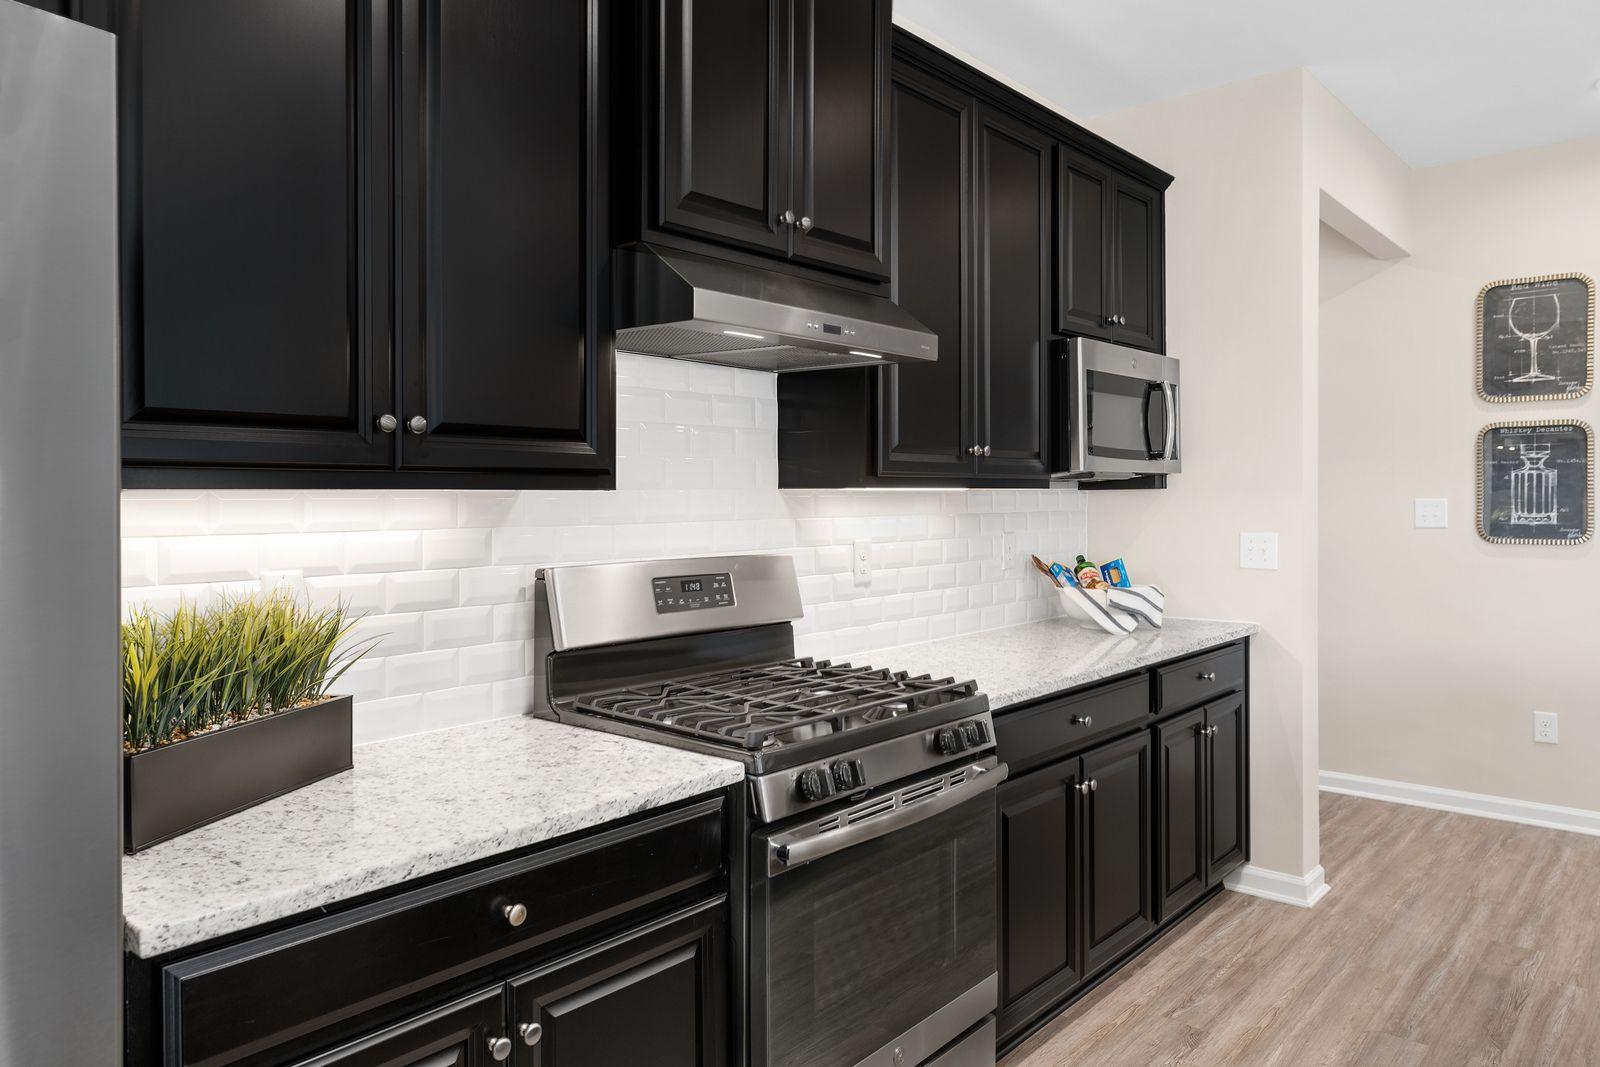 Kitchen featured in the Palladio By Ryan Homes in Warren County, NJ